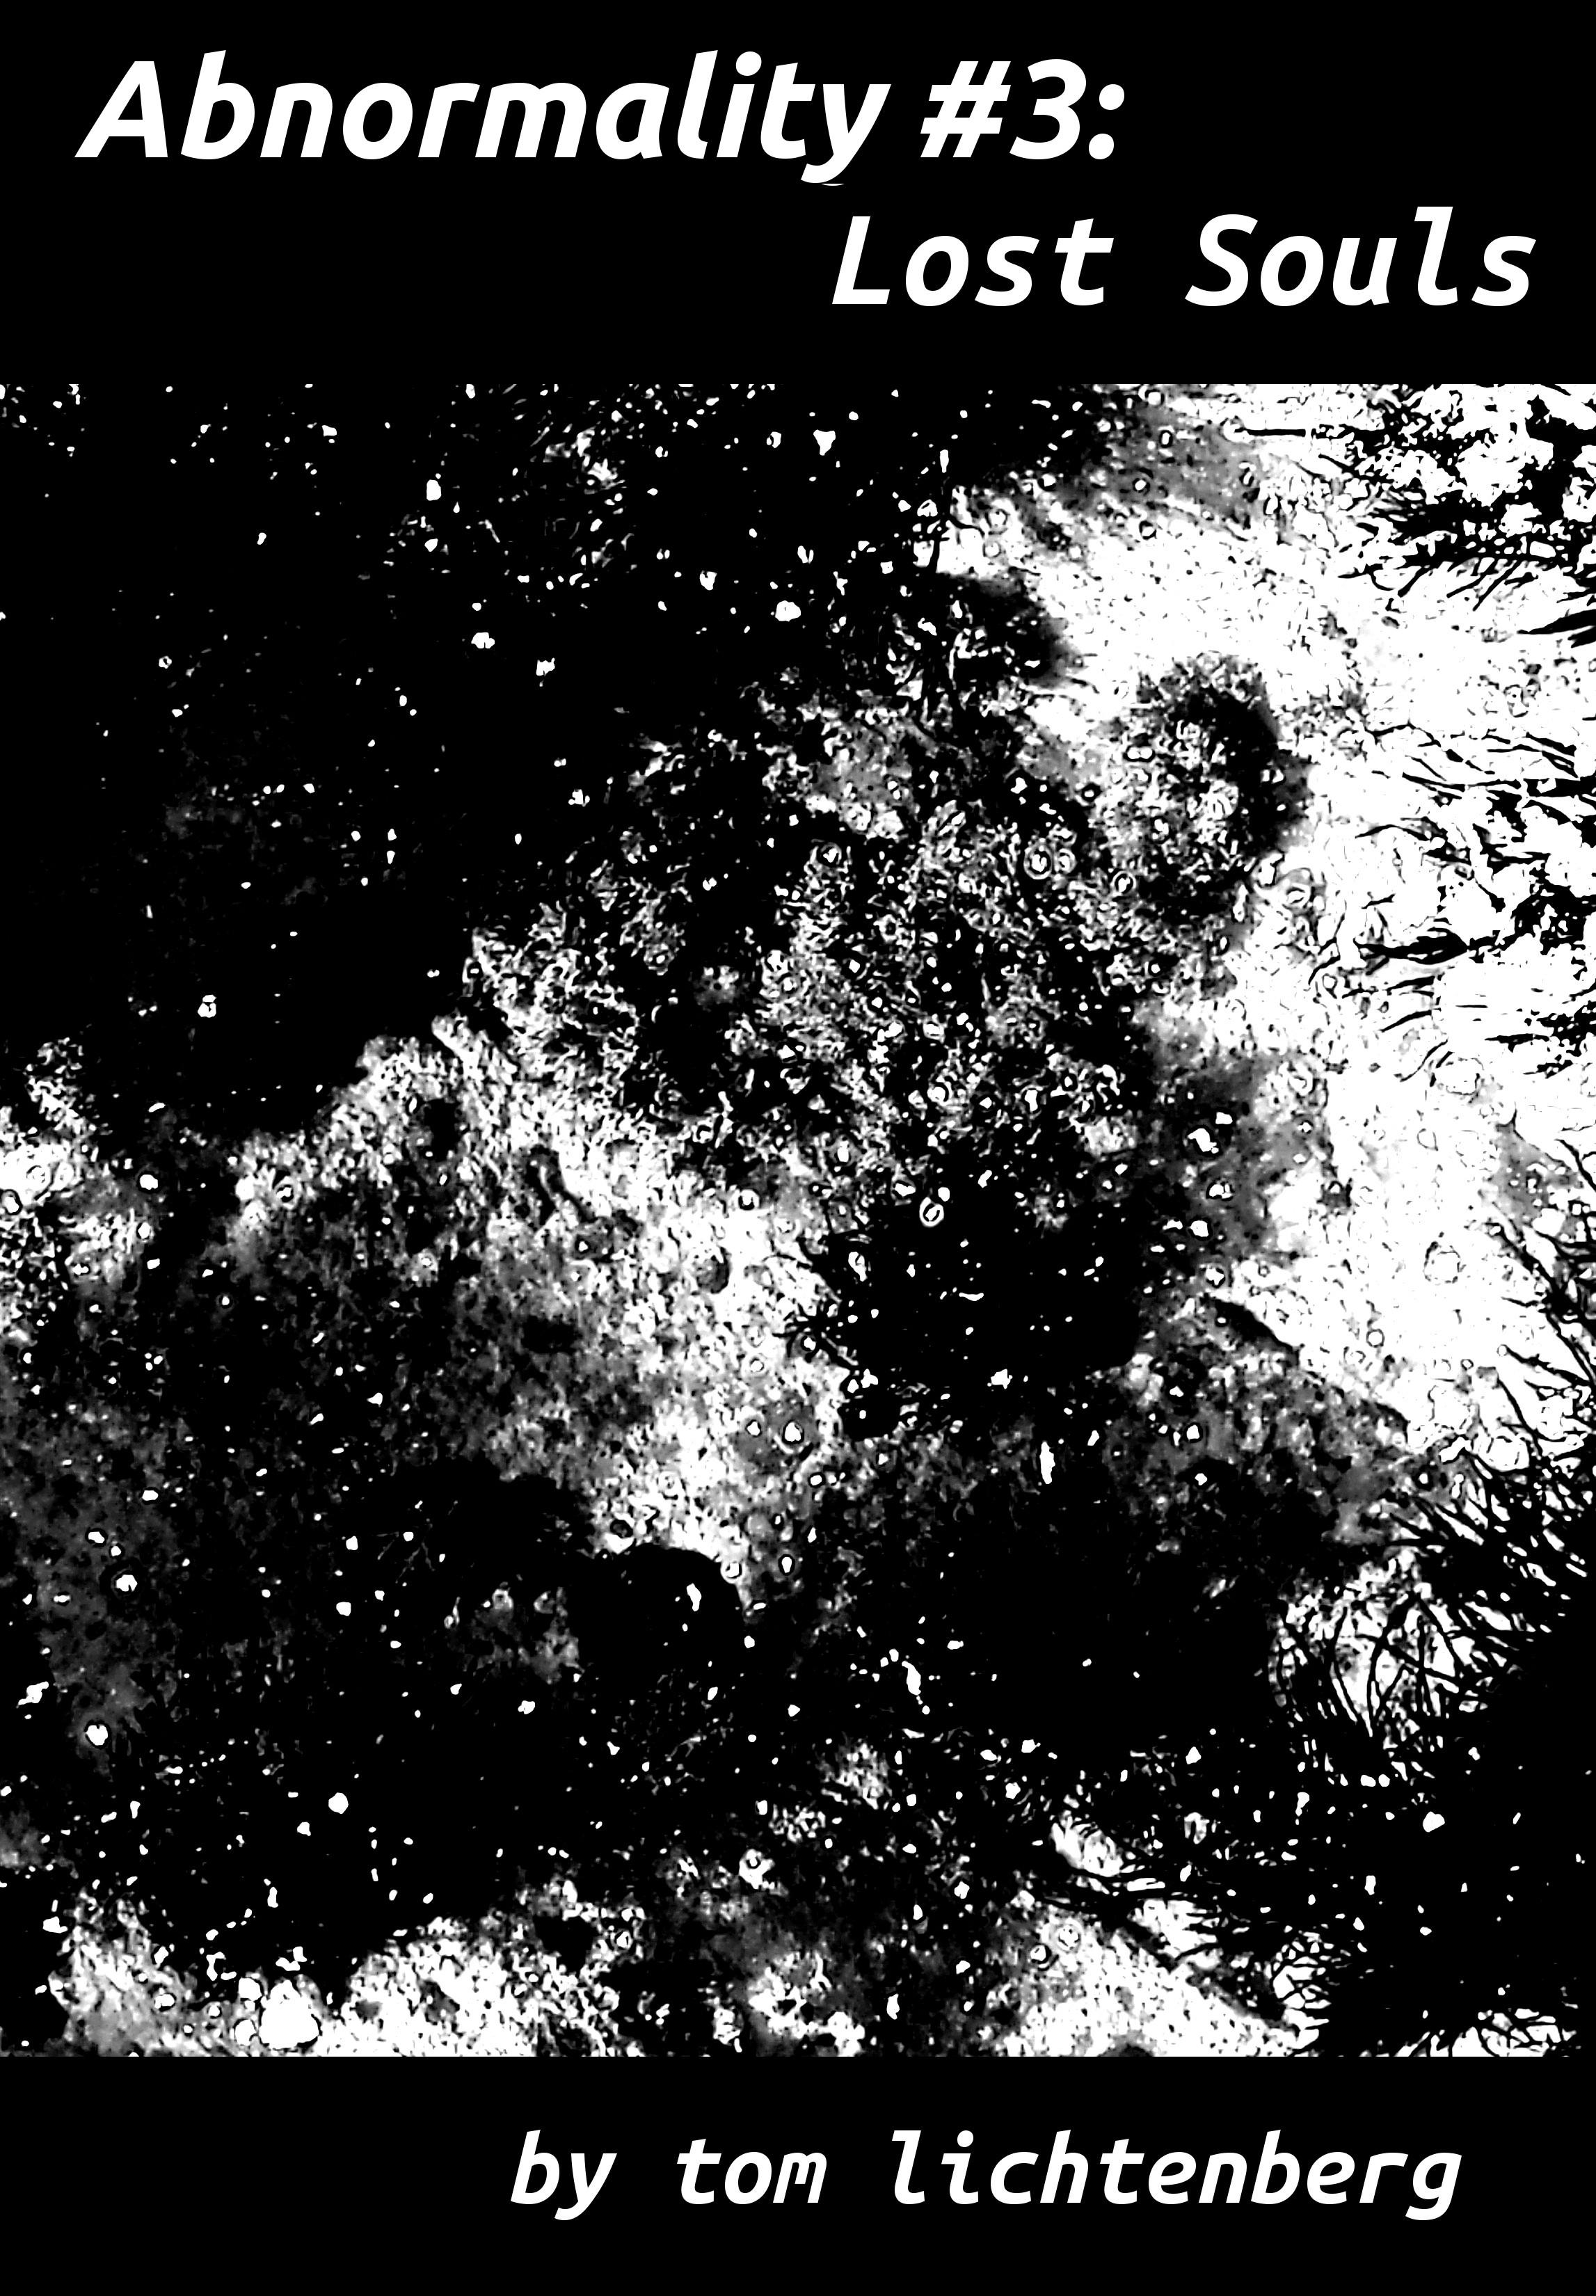 Tom Lichtenberg - Abnormality #3: Lost Souls